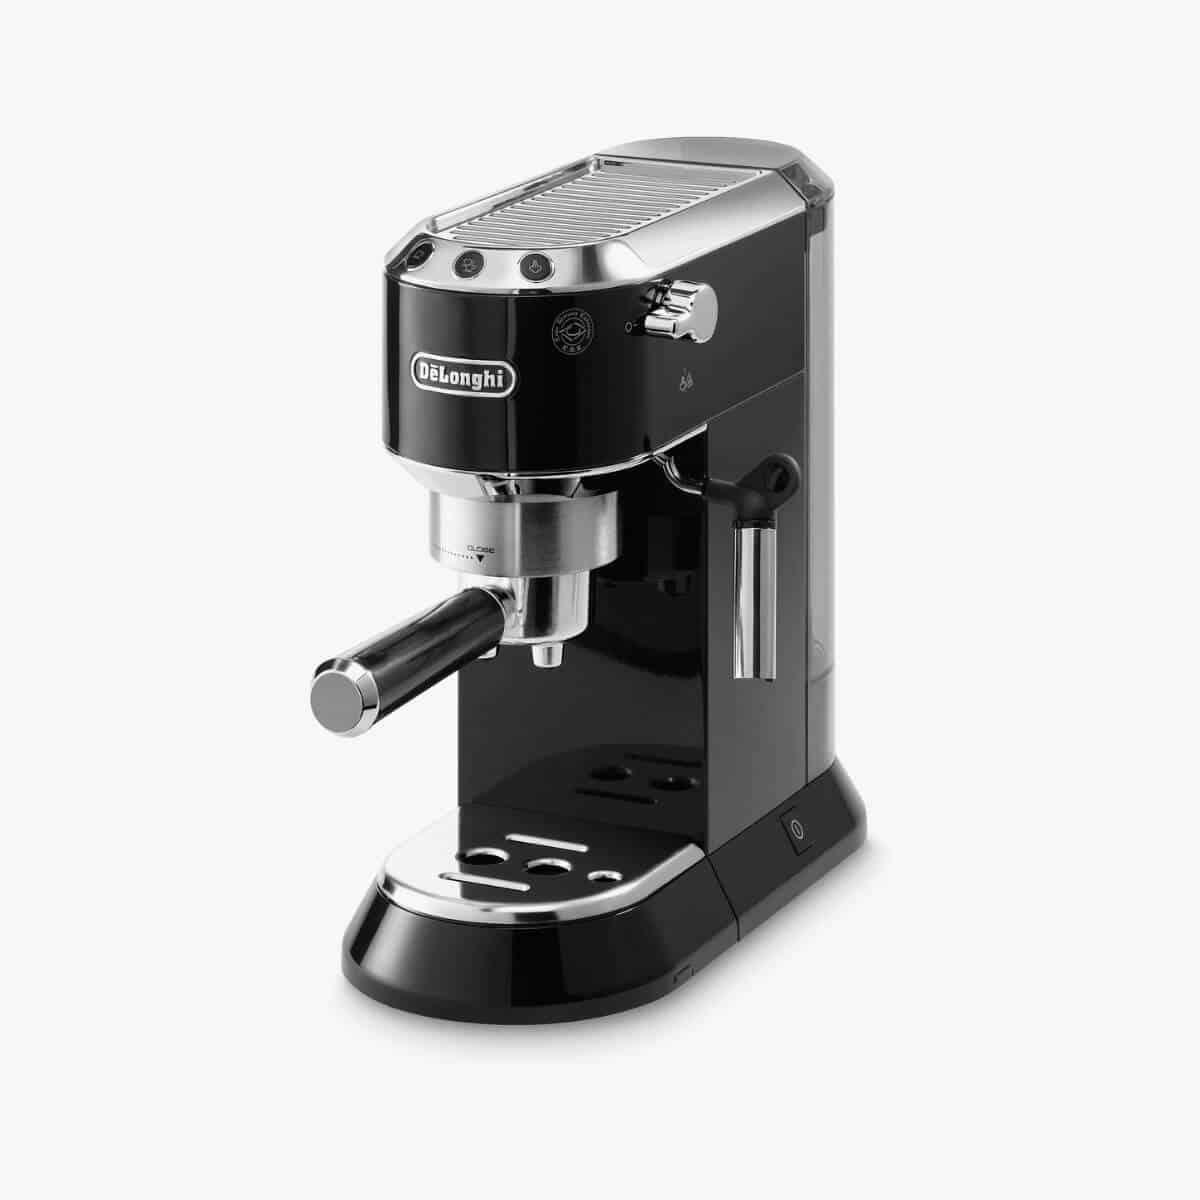 De'Longhi espresso machine.